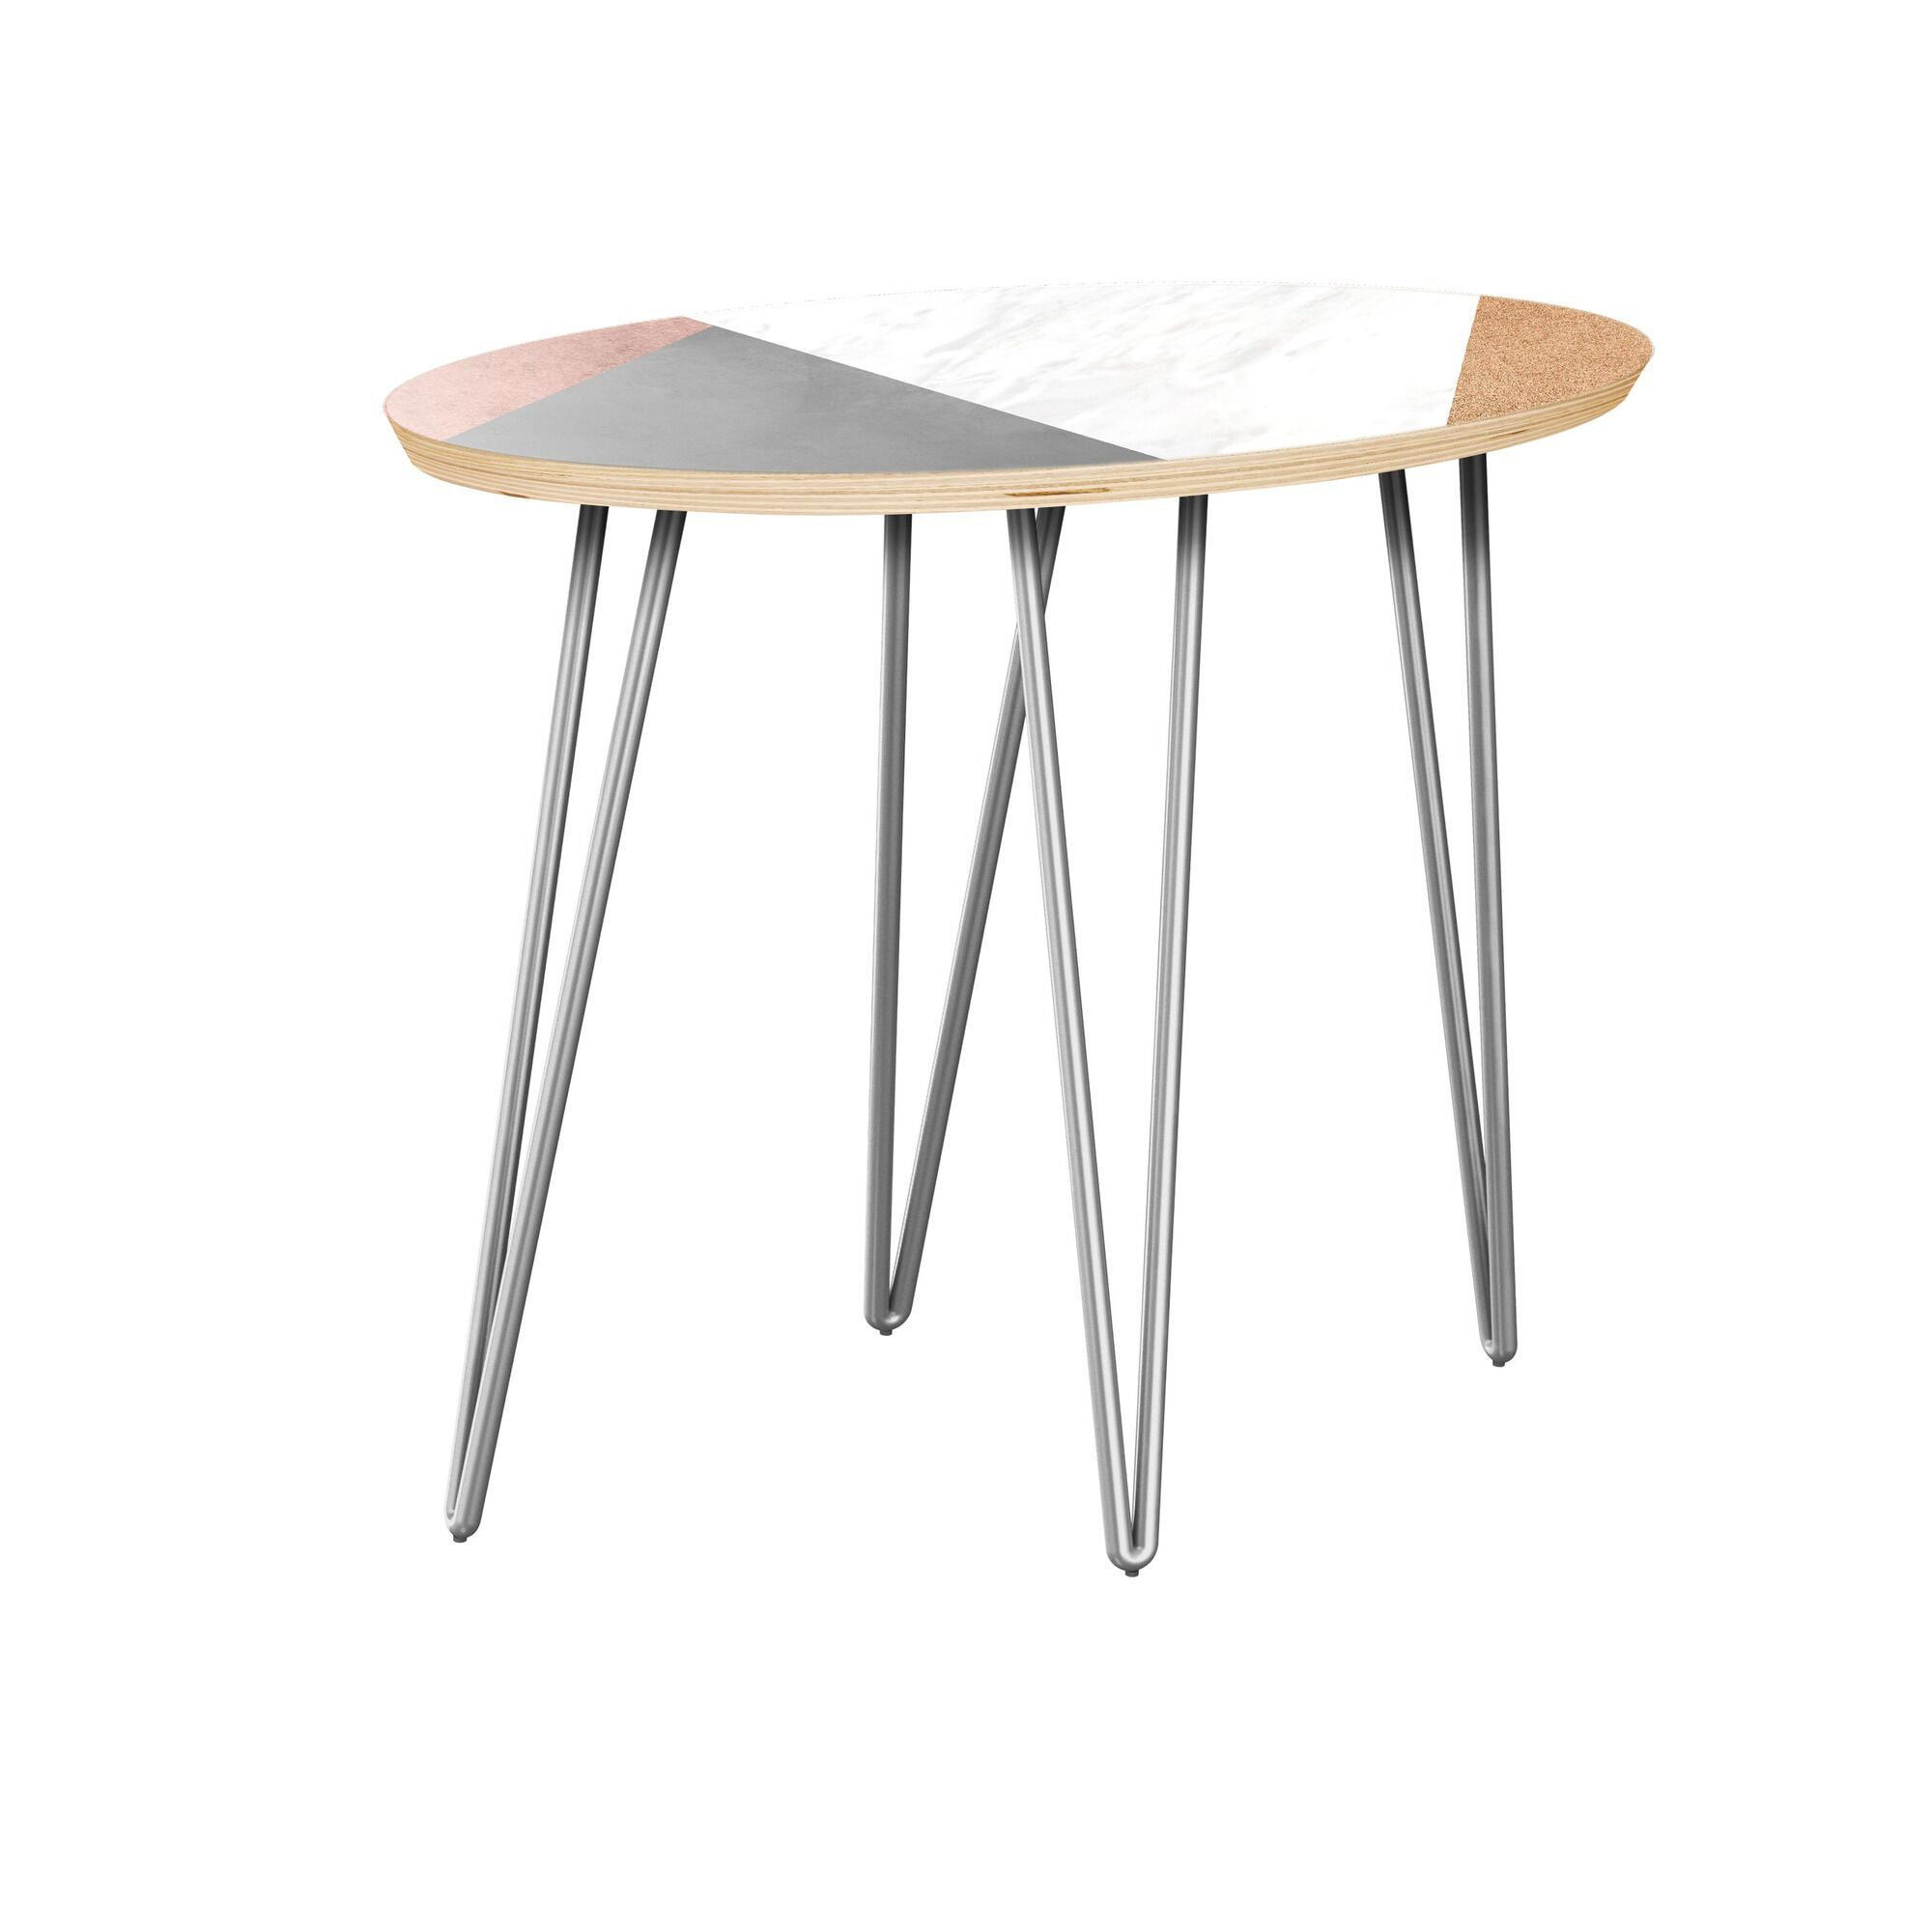 Guiterrez End Table Table Top Color: Natural, Table Base Color: Chrome